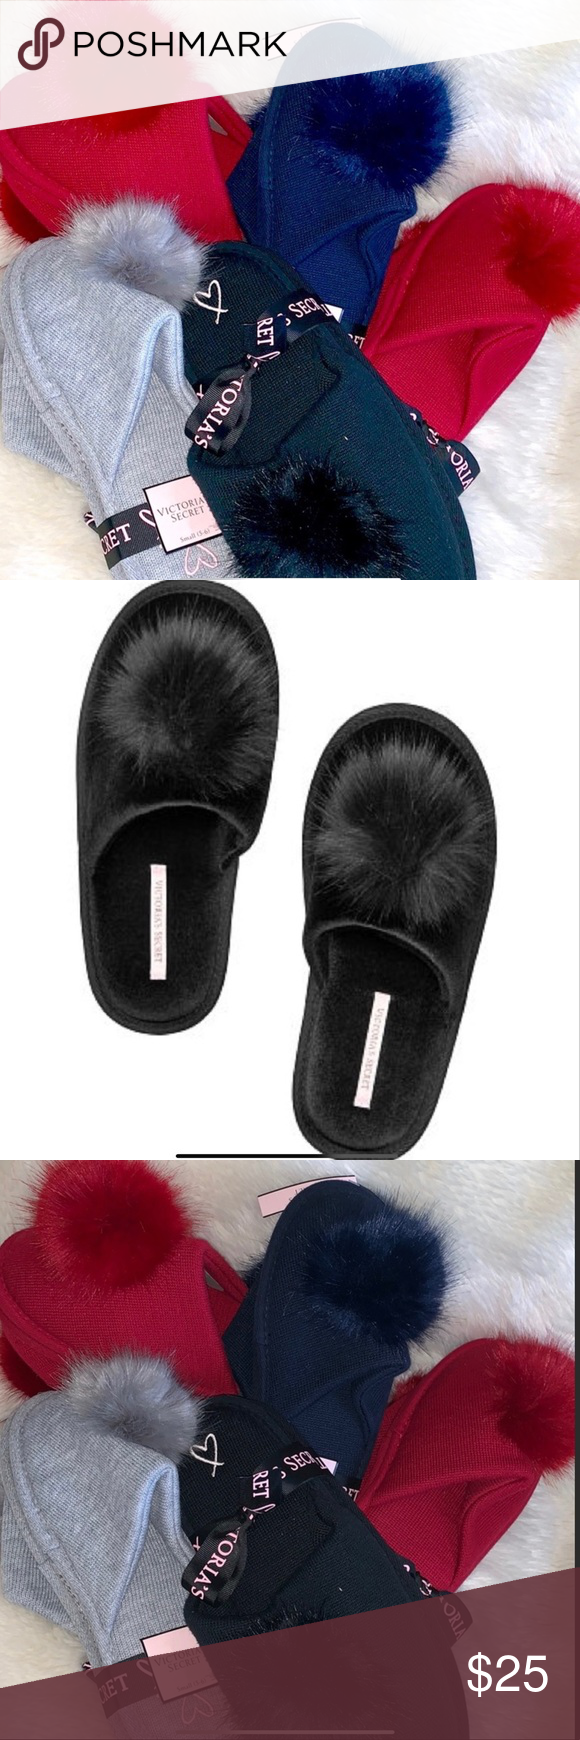 SMALL NWT Victoria's Secret Pom Pom Slippers Heather Gray 5-6